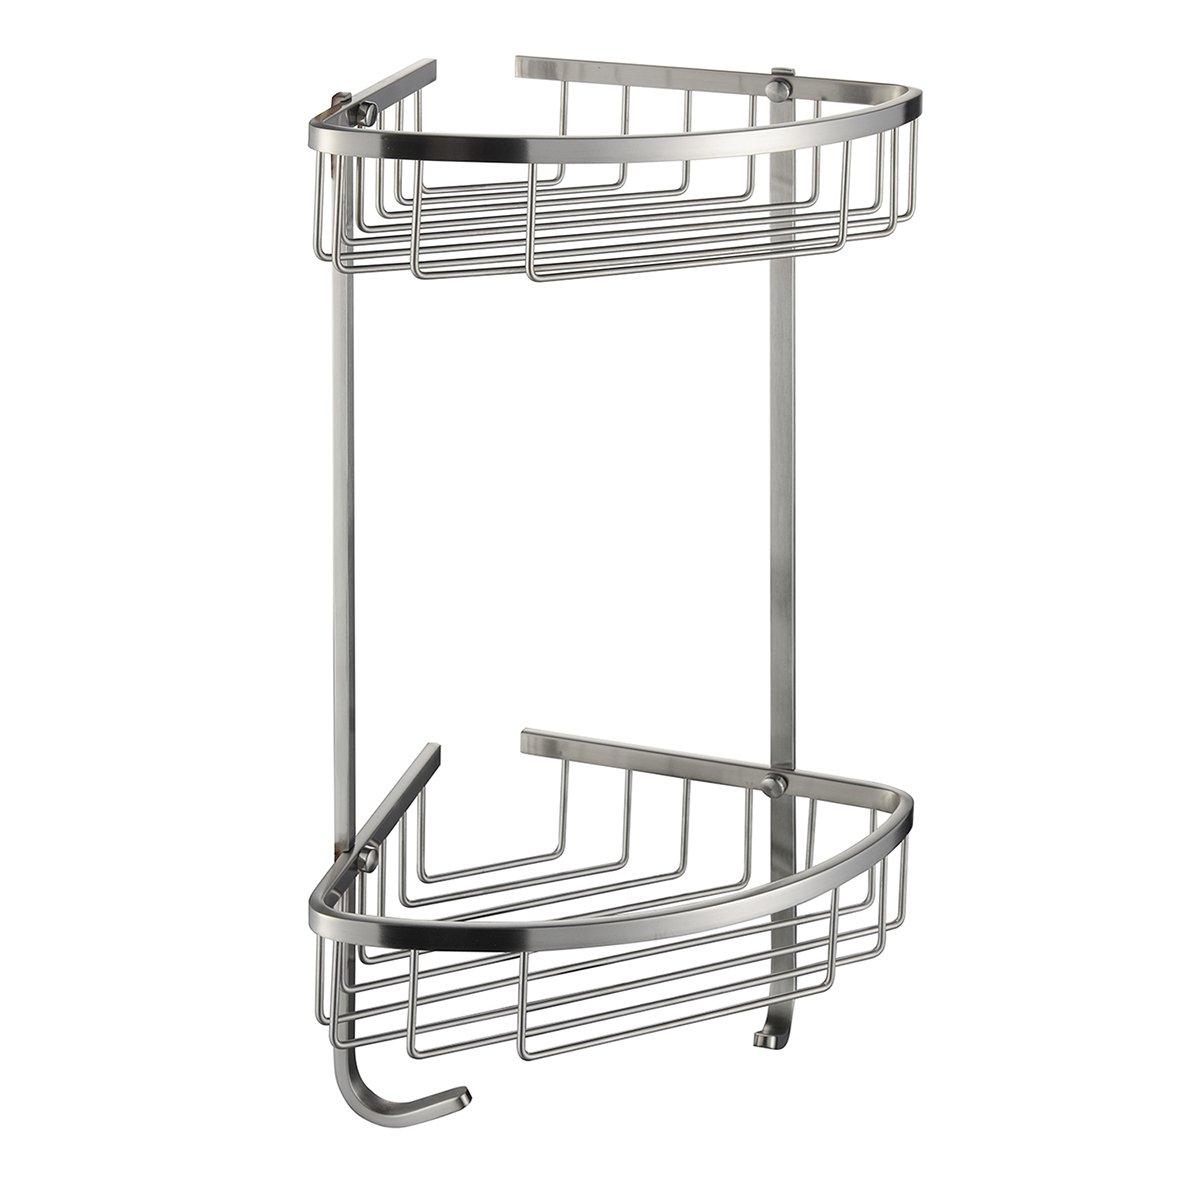 2 Tier Shower Caddy Corner Bathroom Stainless Steel Soap Bar Basket ...